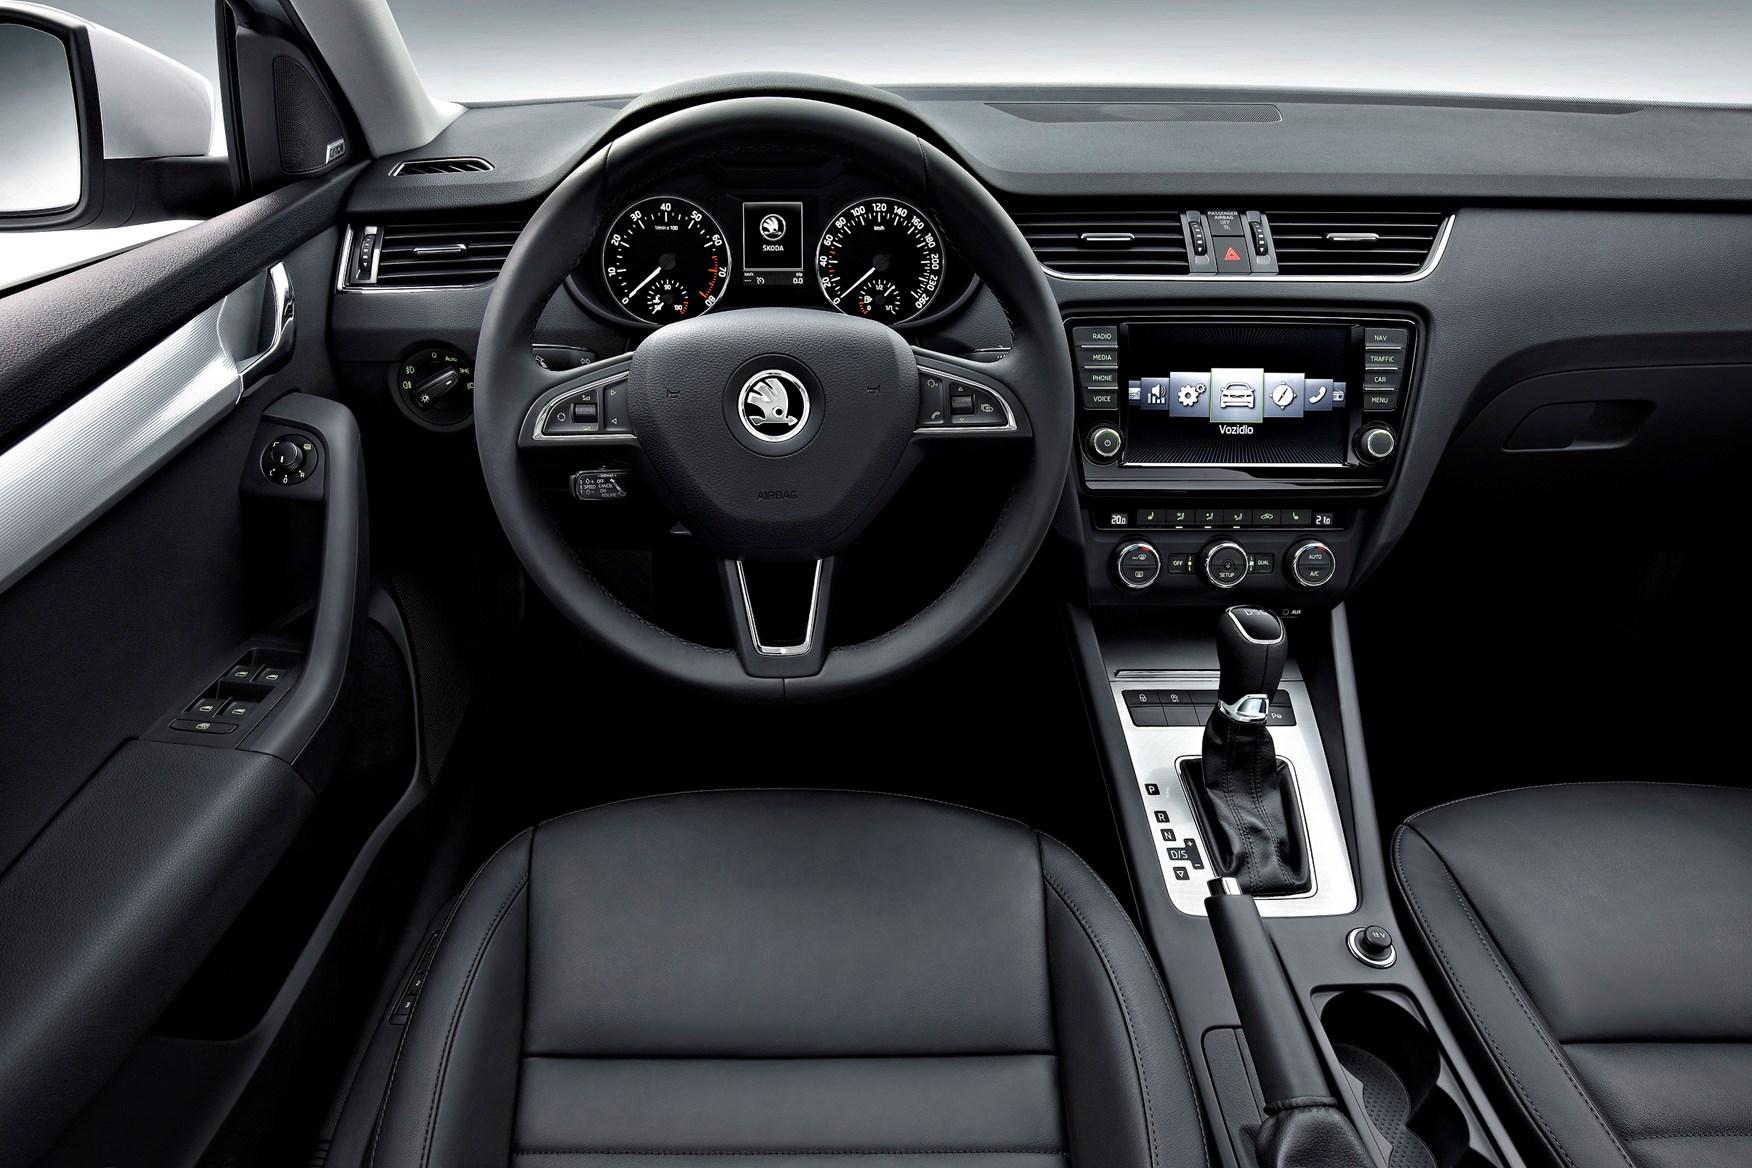 Skoda Octavia hatchback review: summary | Parkers